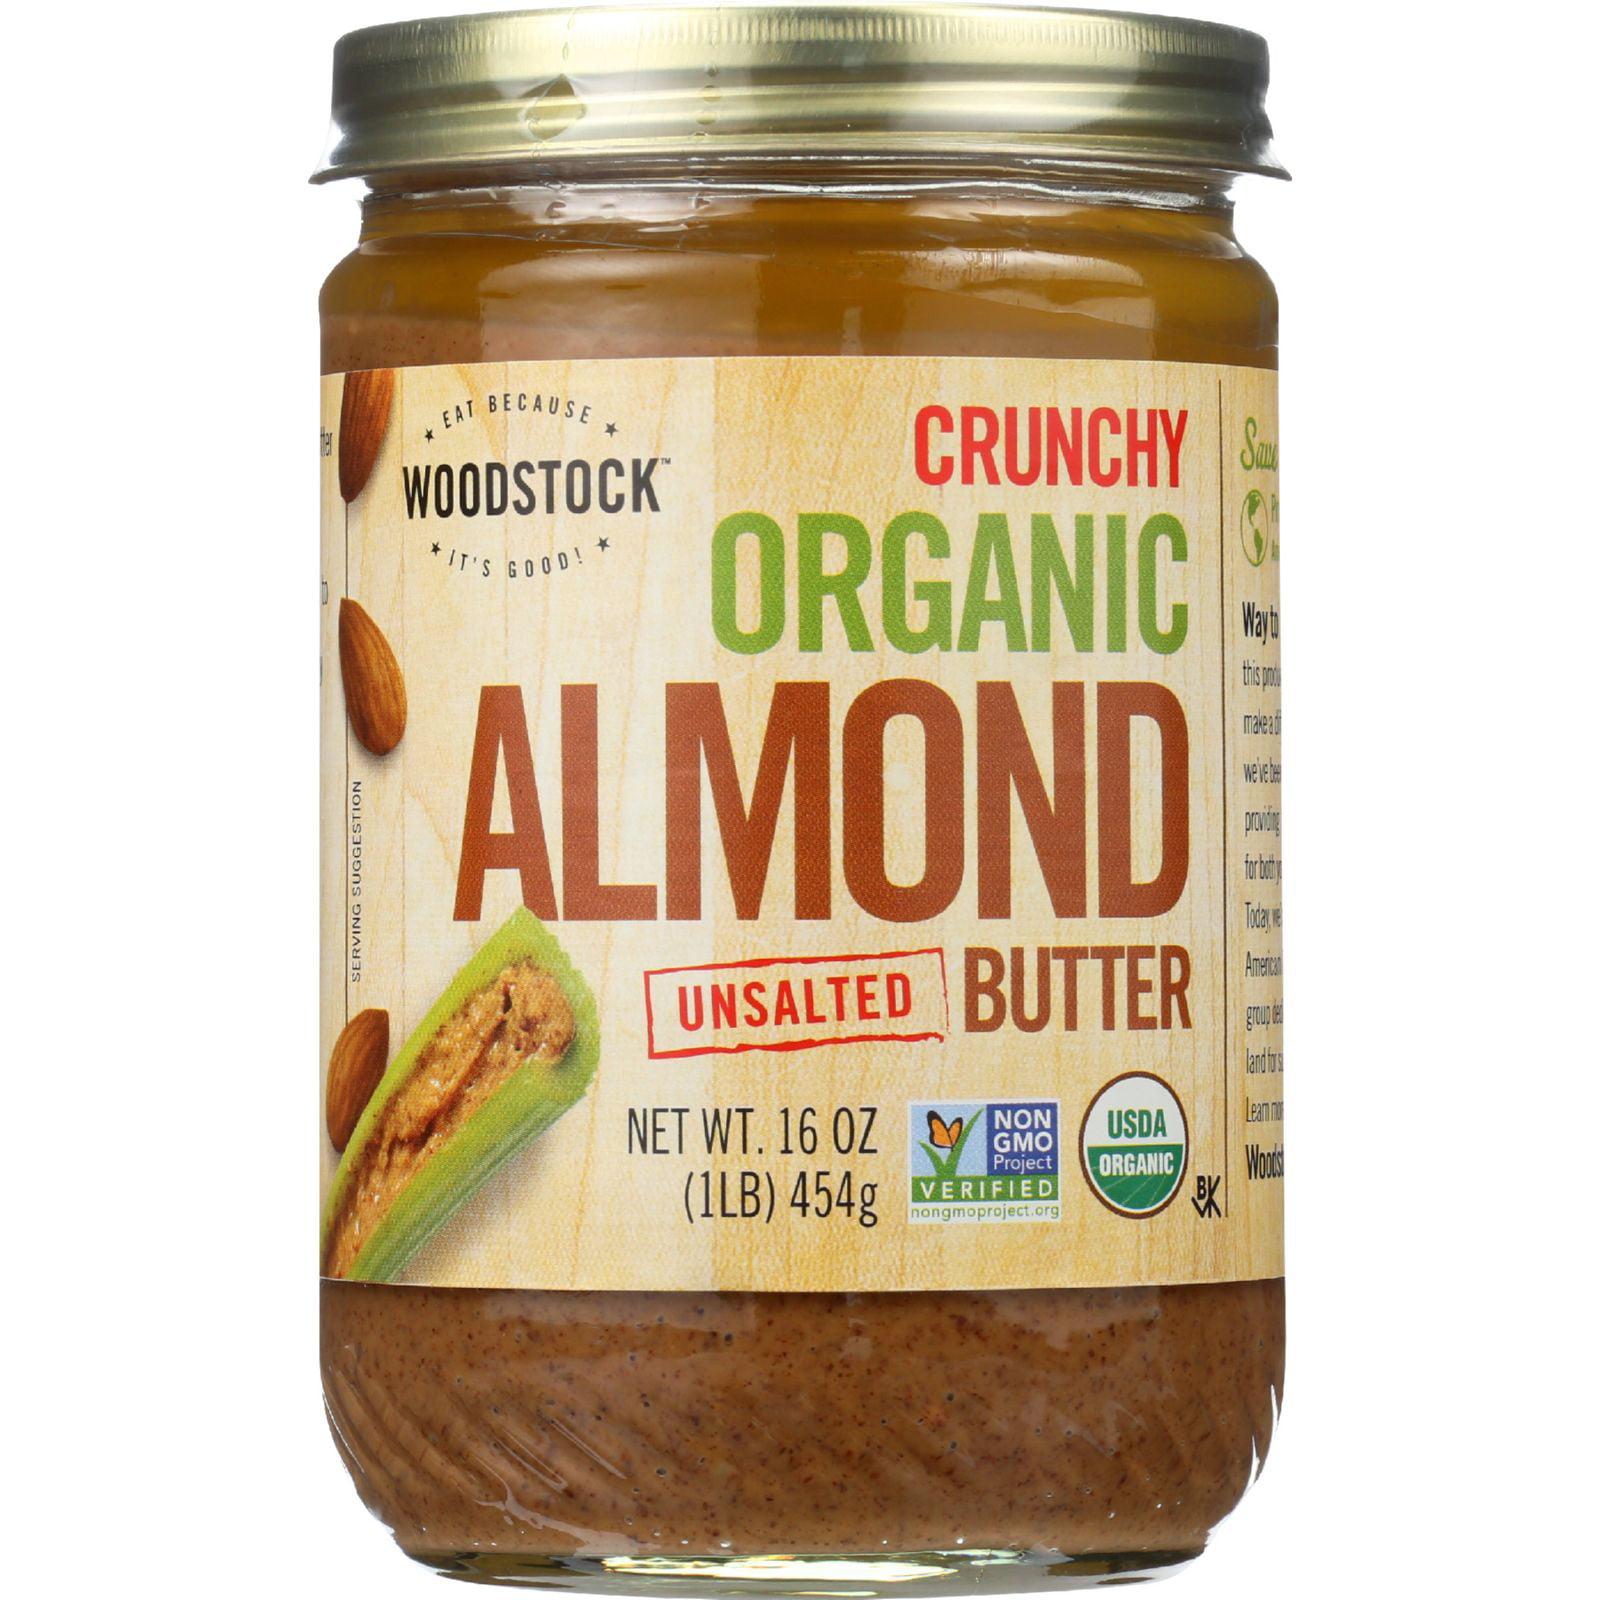 Woodstock organic almond butter